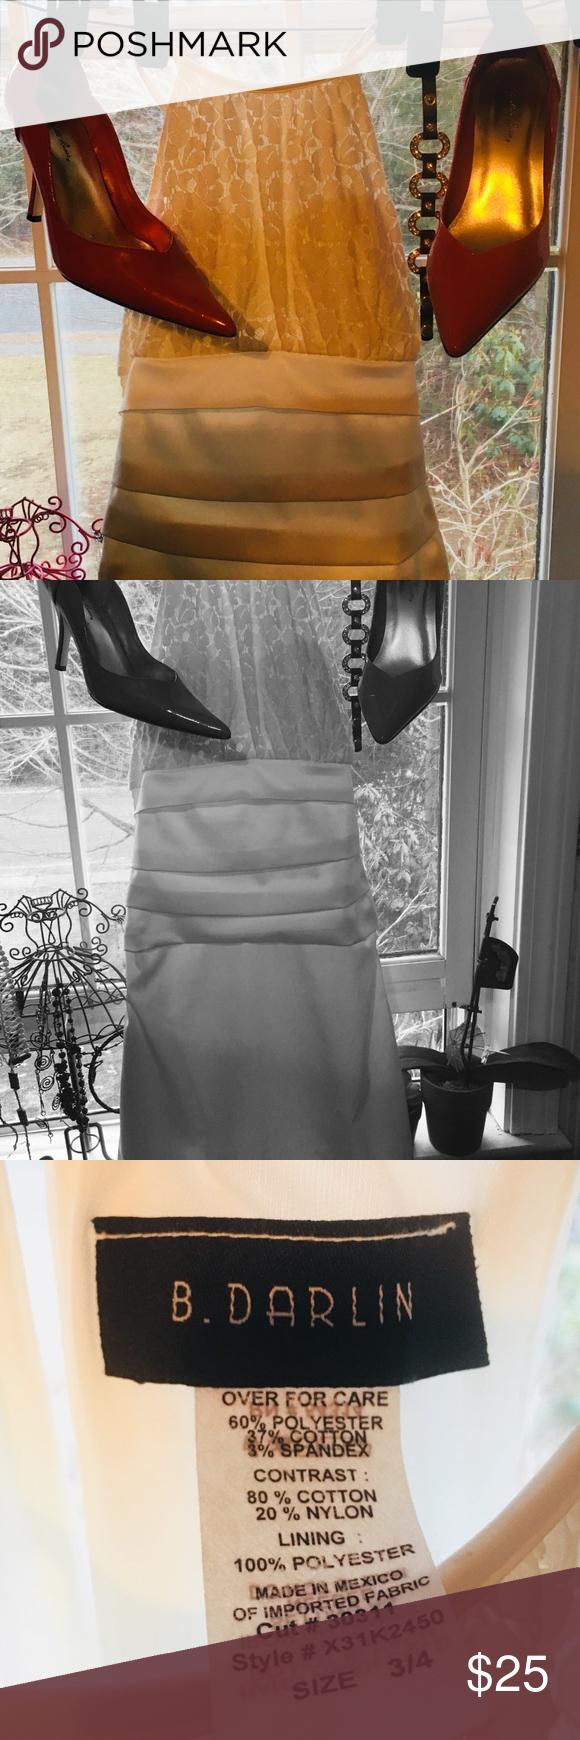 B darlin black lace dress  BDarlin ivory Party Dress  My Posh Picks  Pinterest